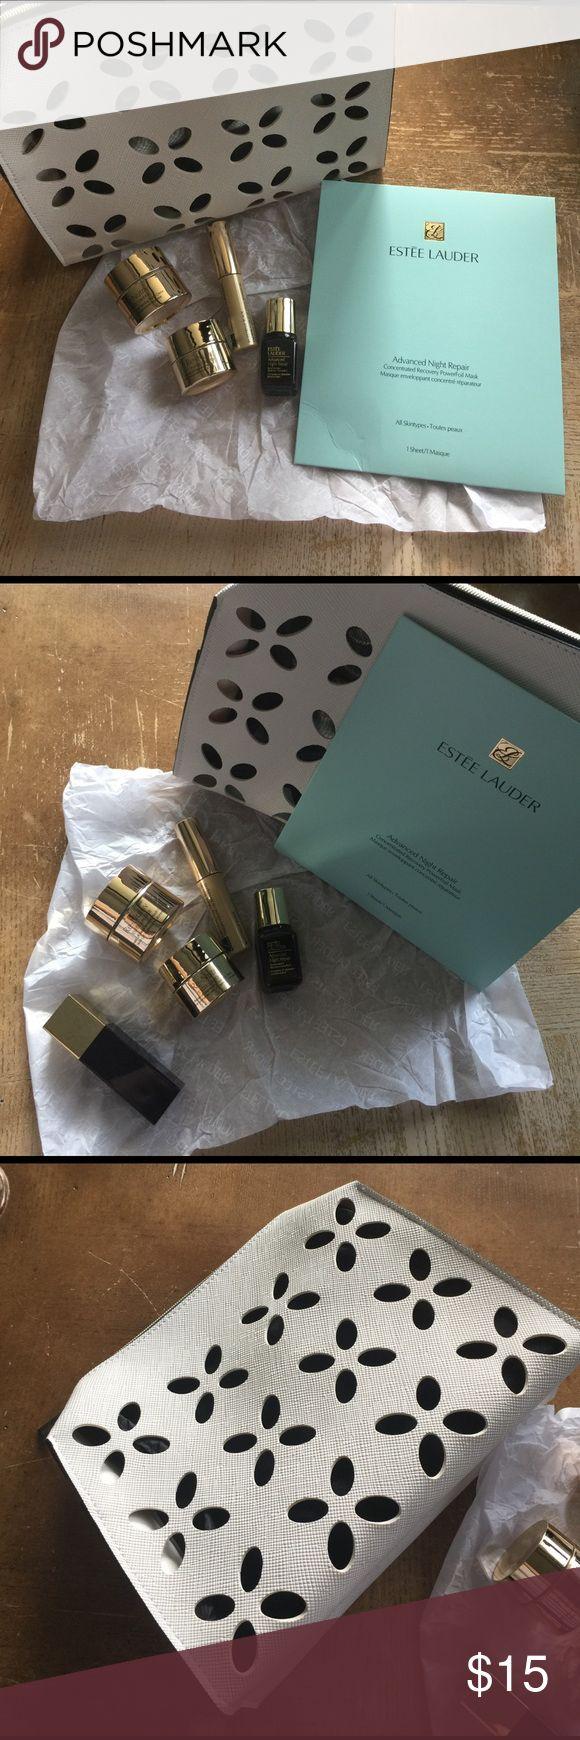 25+ Best Ideas About Estee Lauder Gift Set On Pinterest   Estee Lauder Perfume Perfume And ...